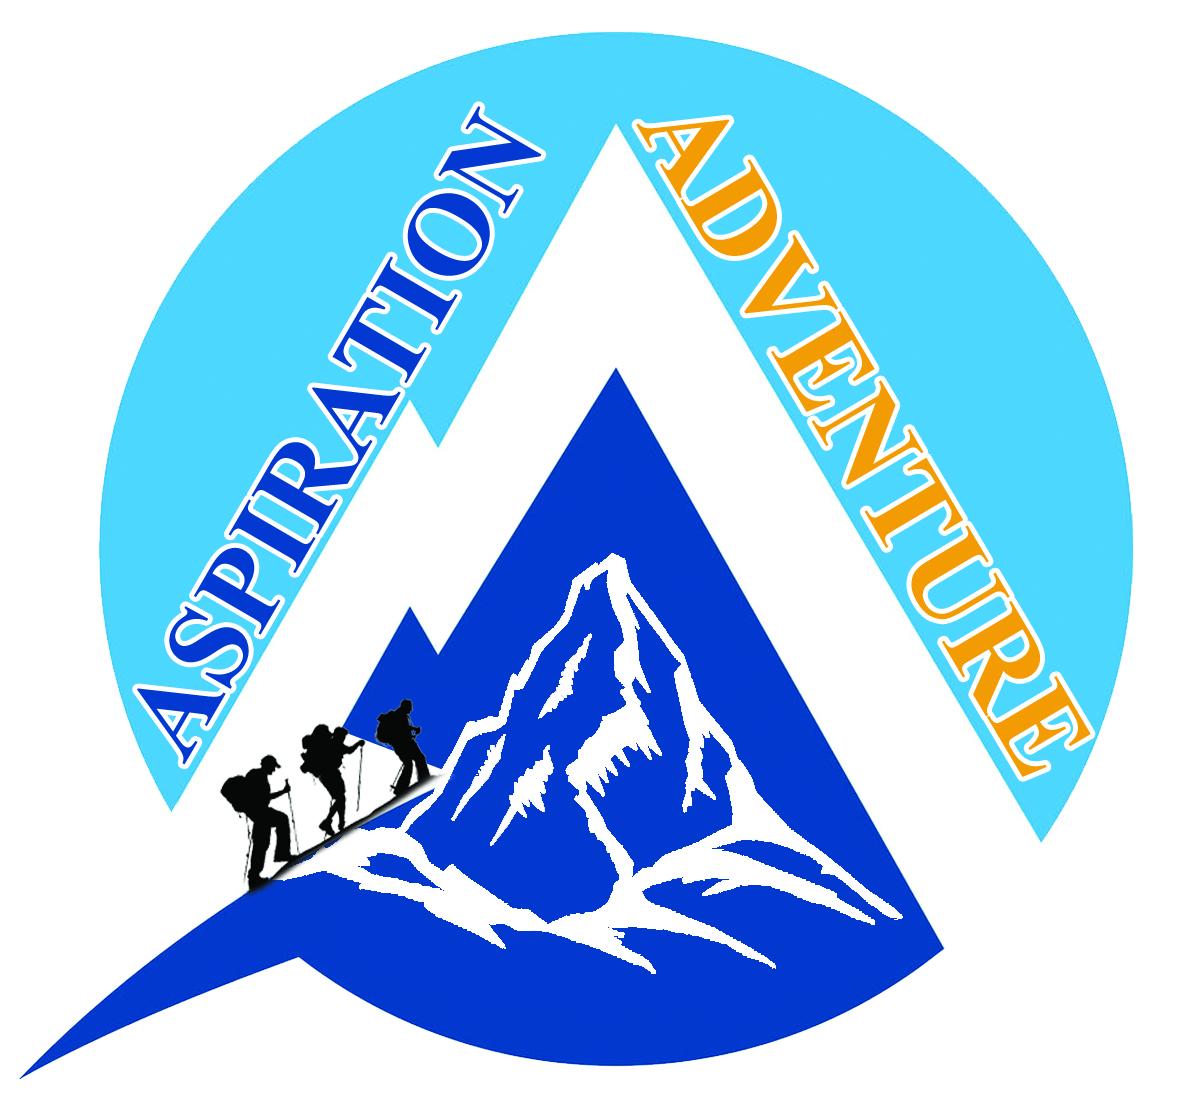 Aspiration Adventure